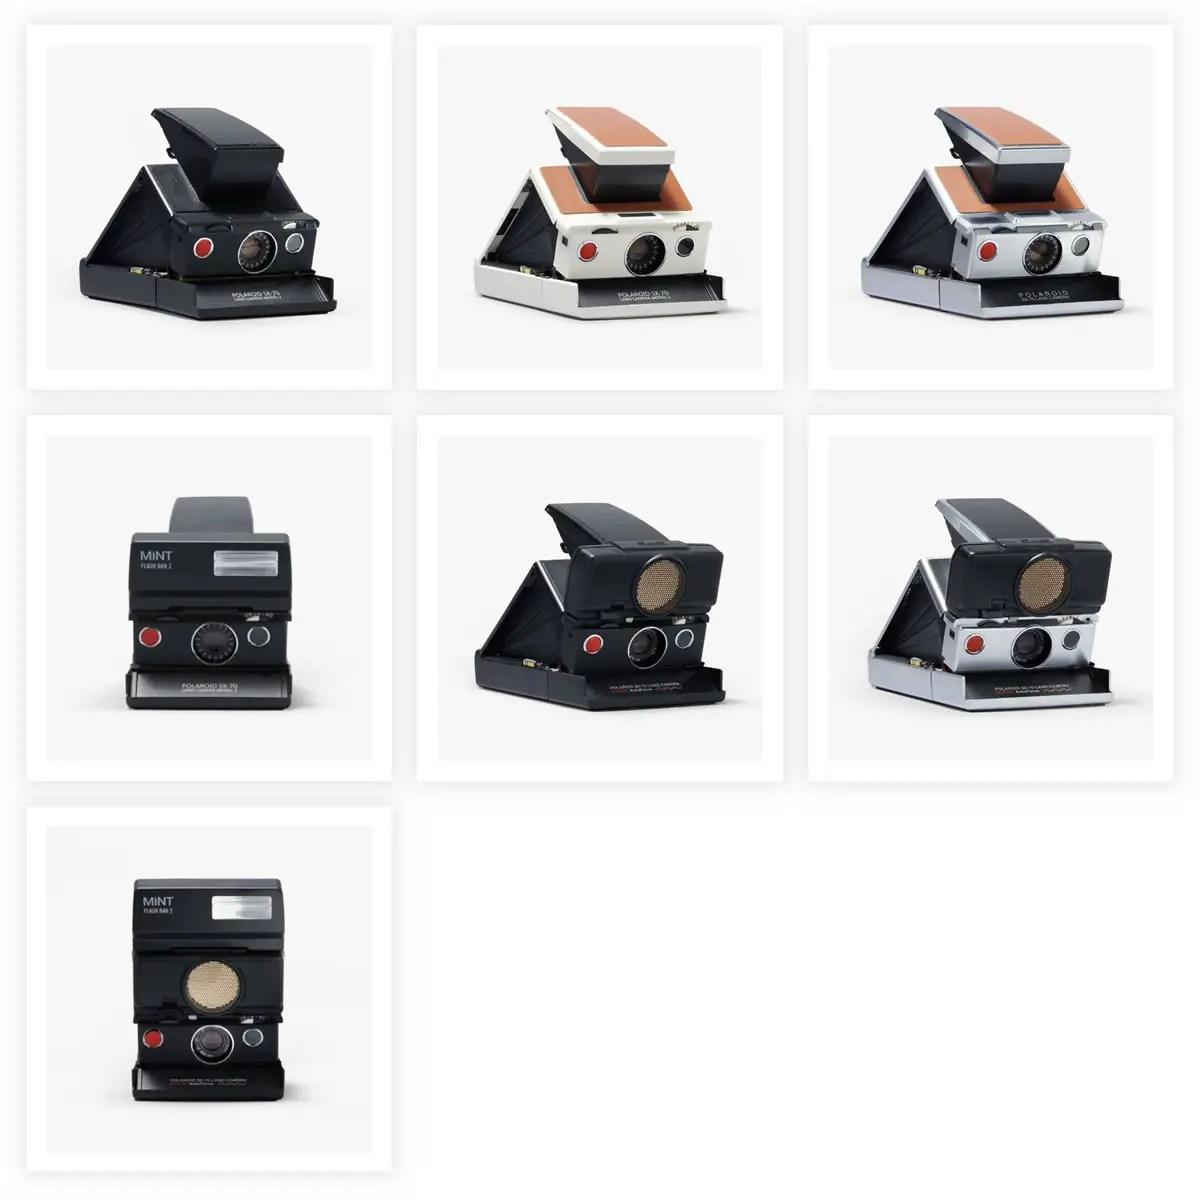 Polaroid SX-70 cameras. Credit: Polaroid.com